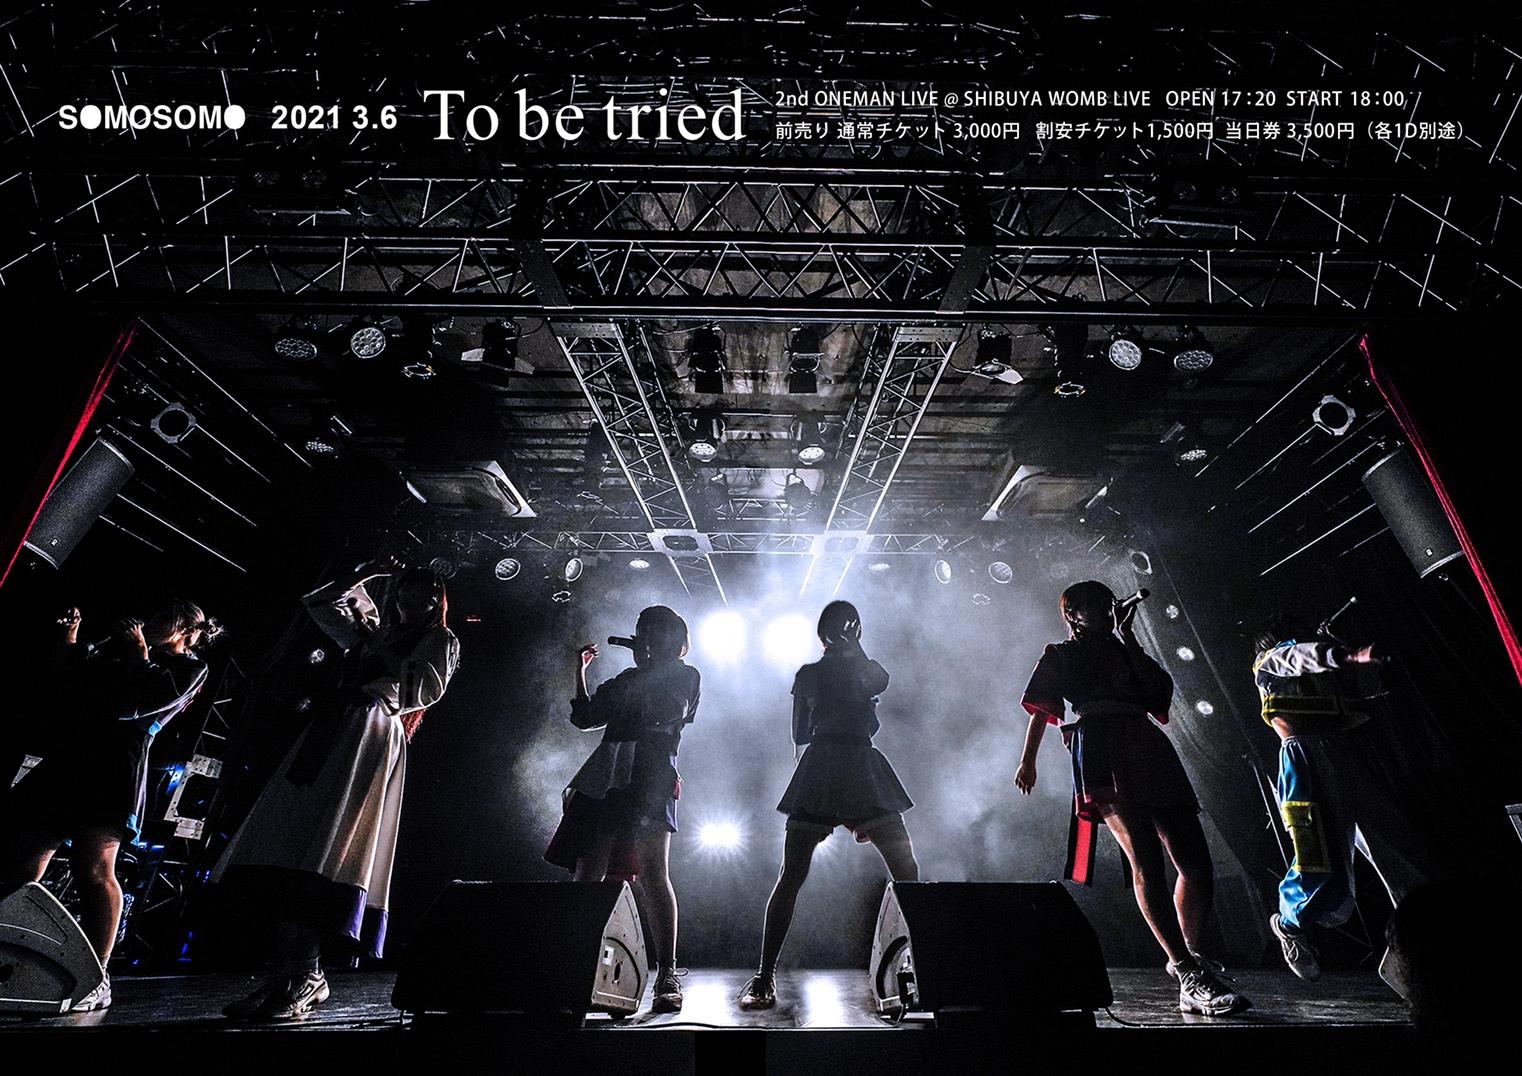 SOMOSOMO 2nd ONE MAN LIVE 『To be tried』